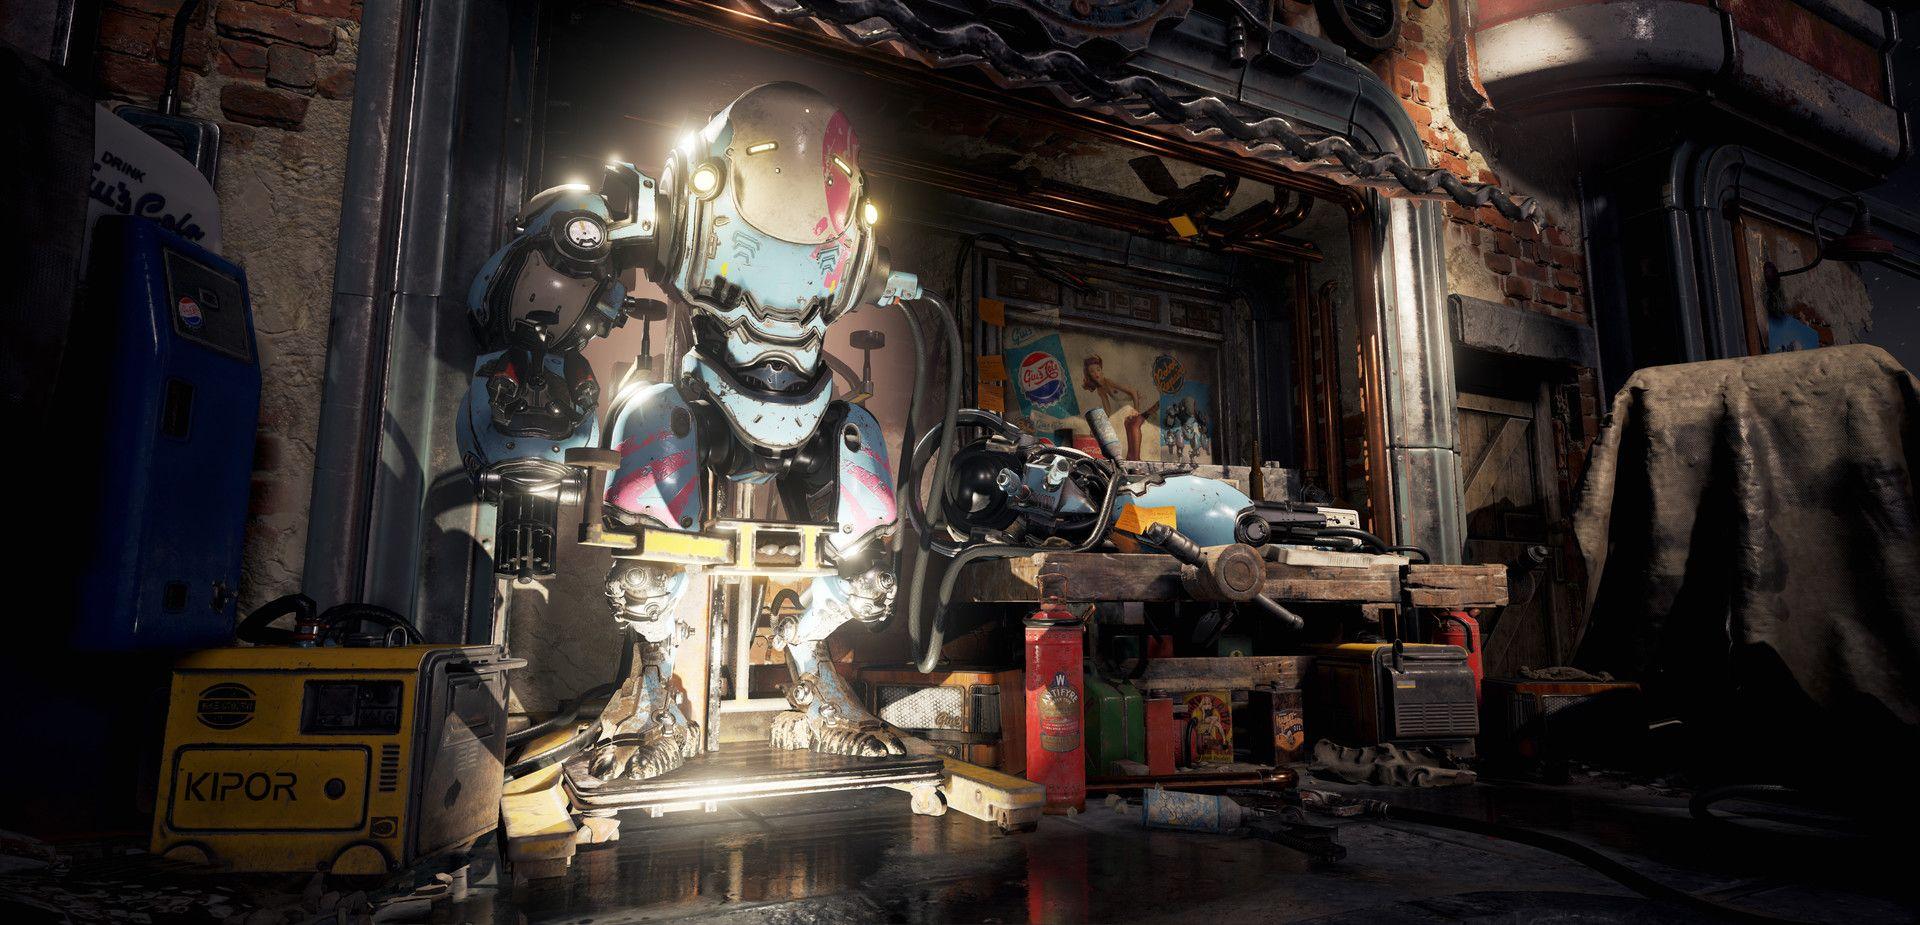 Artstation Fallout 4 Inspired Mech Garage Diorama Ben Keeling Mech Diorama Inspiration